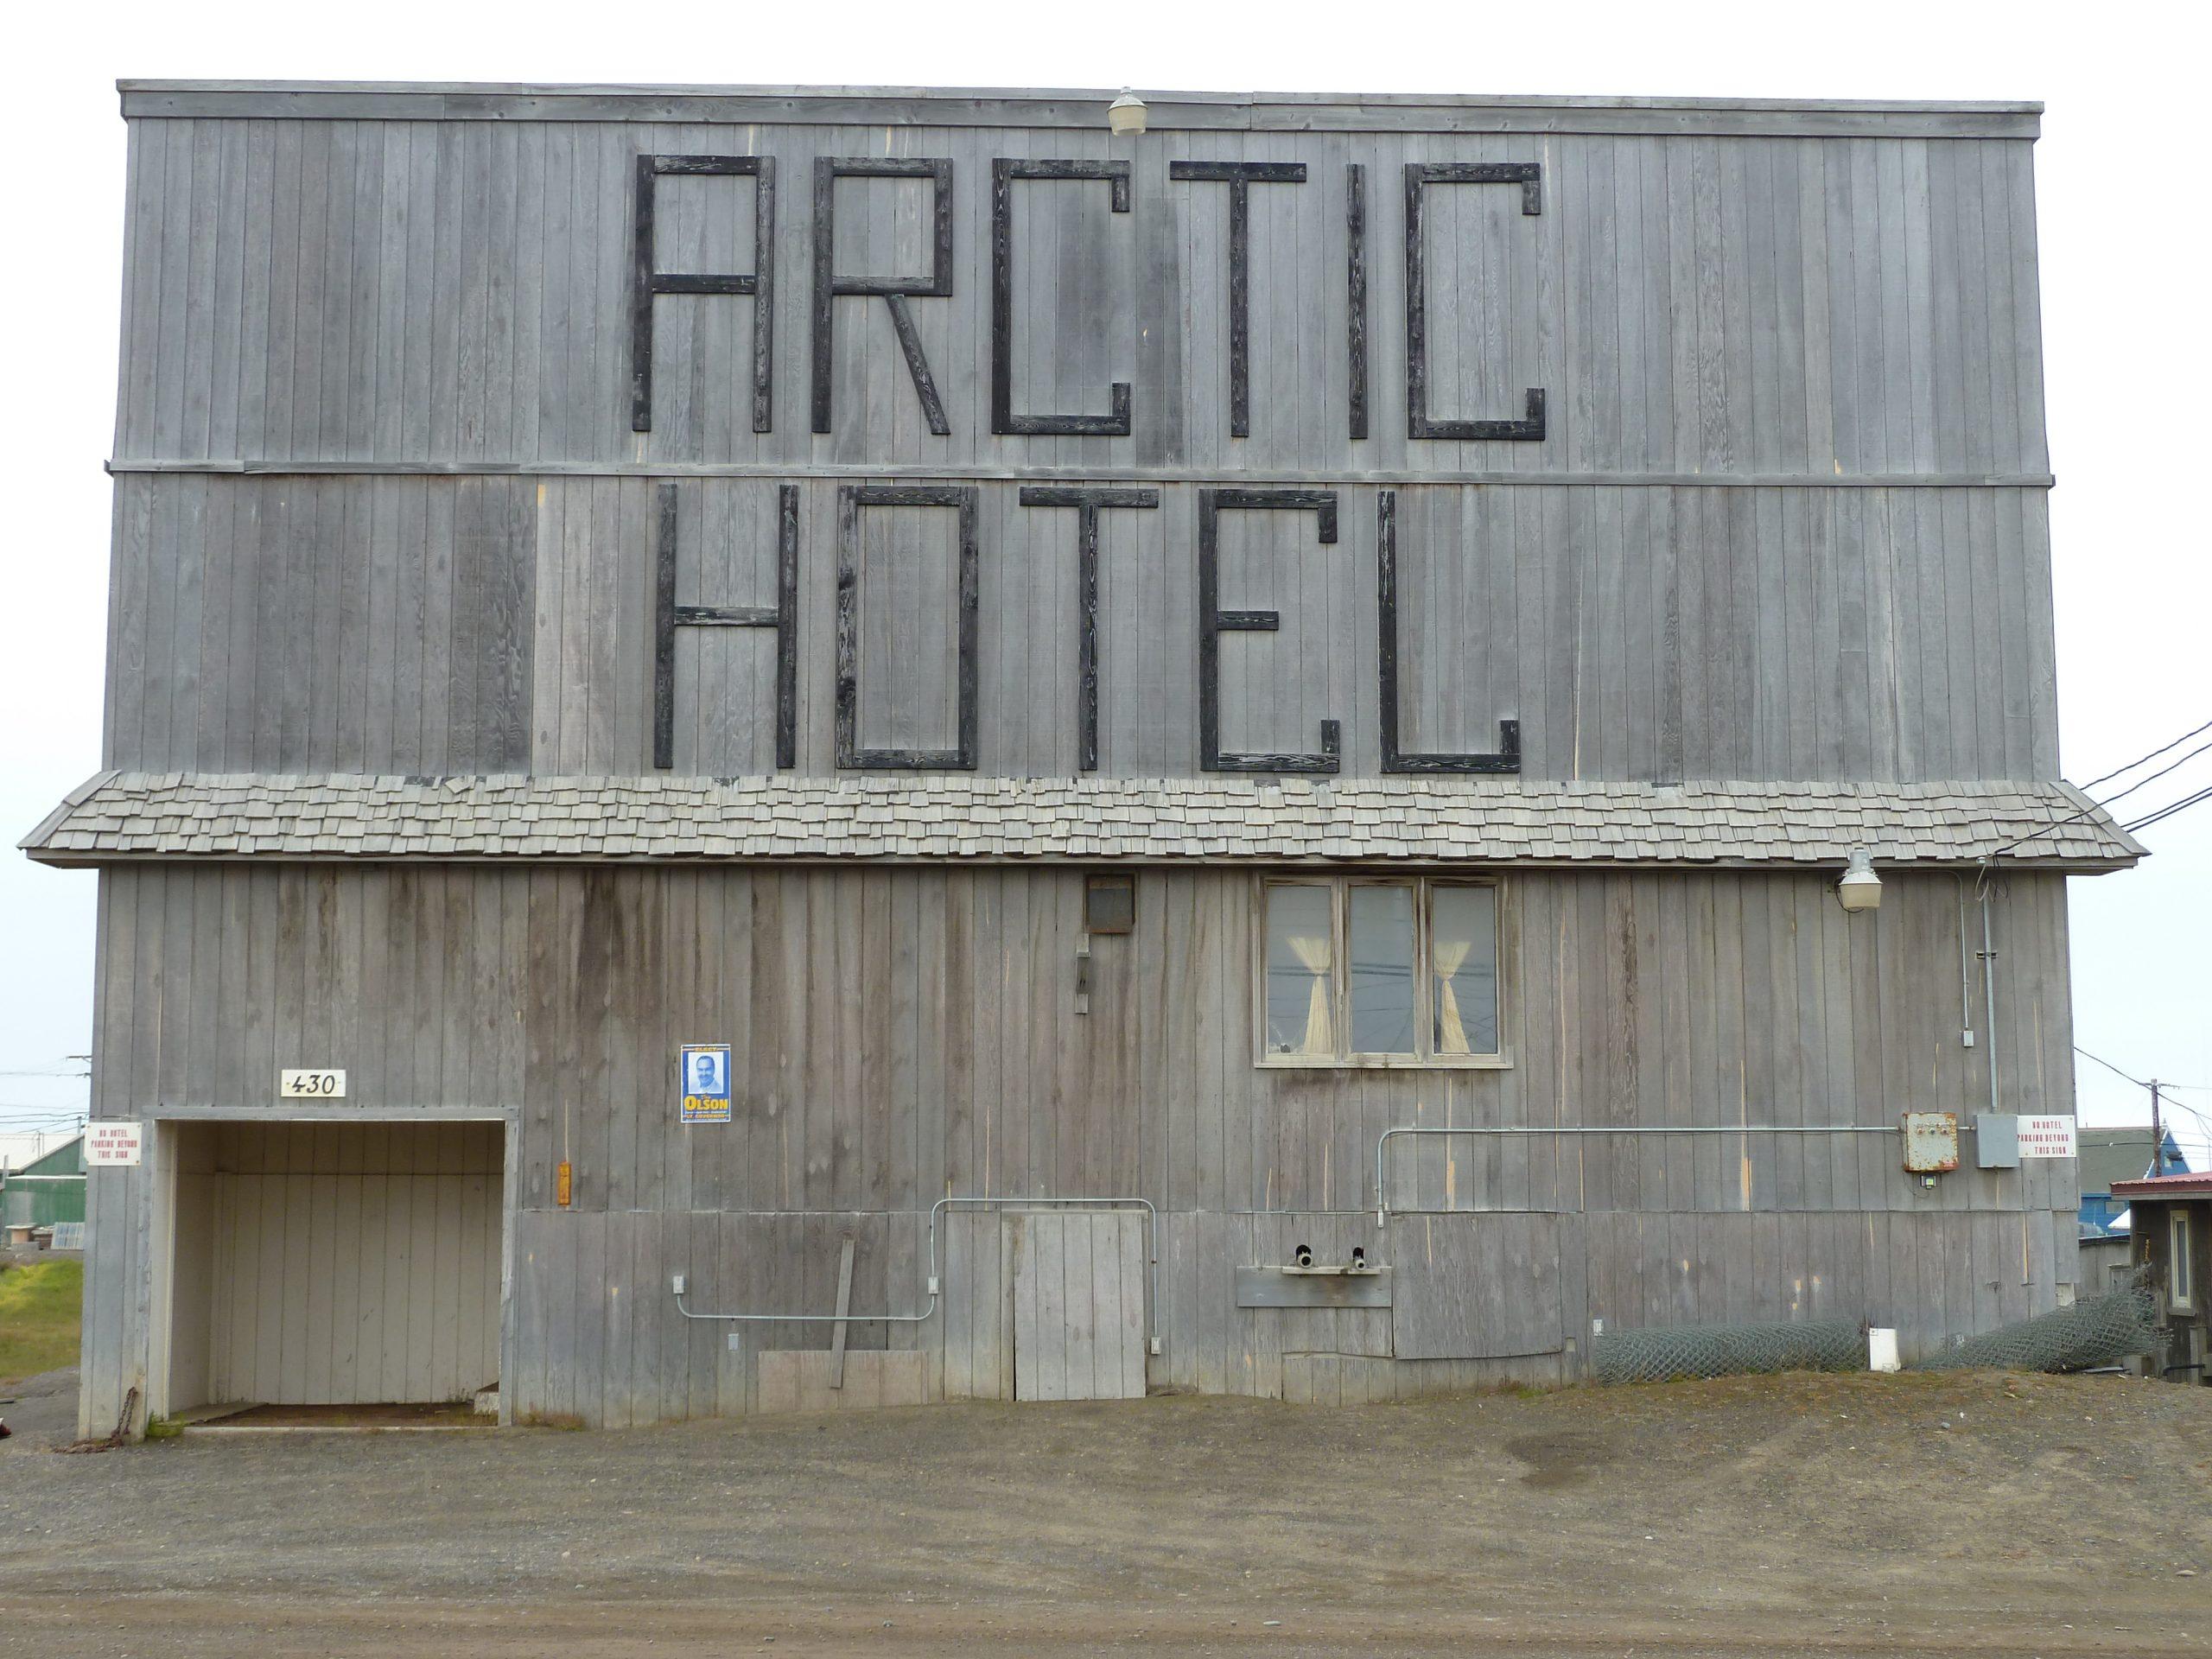 Radreise Alaska 2010 - Altes Hotel in Barrow